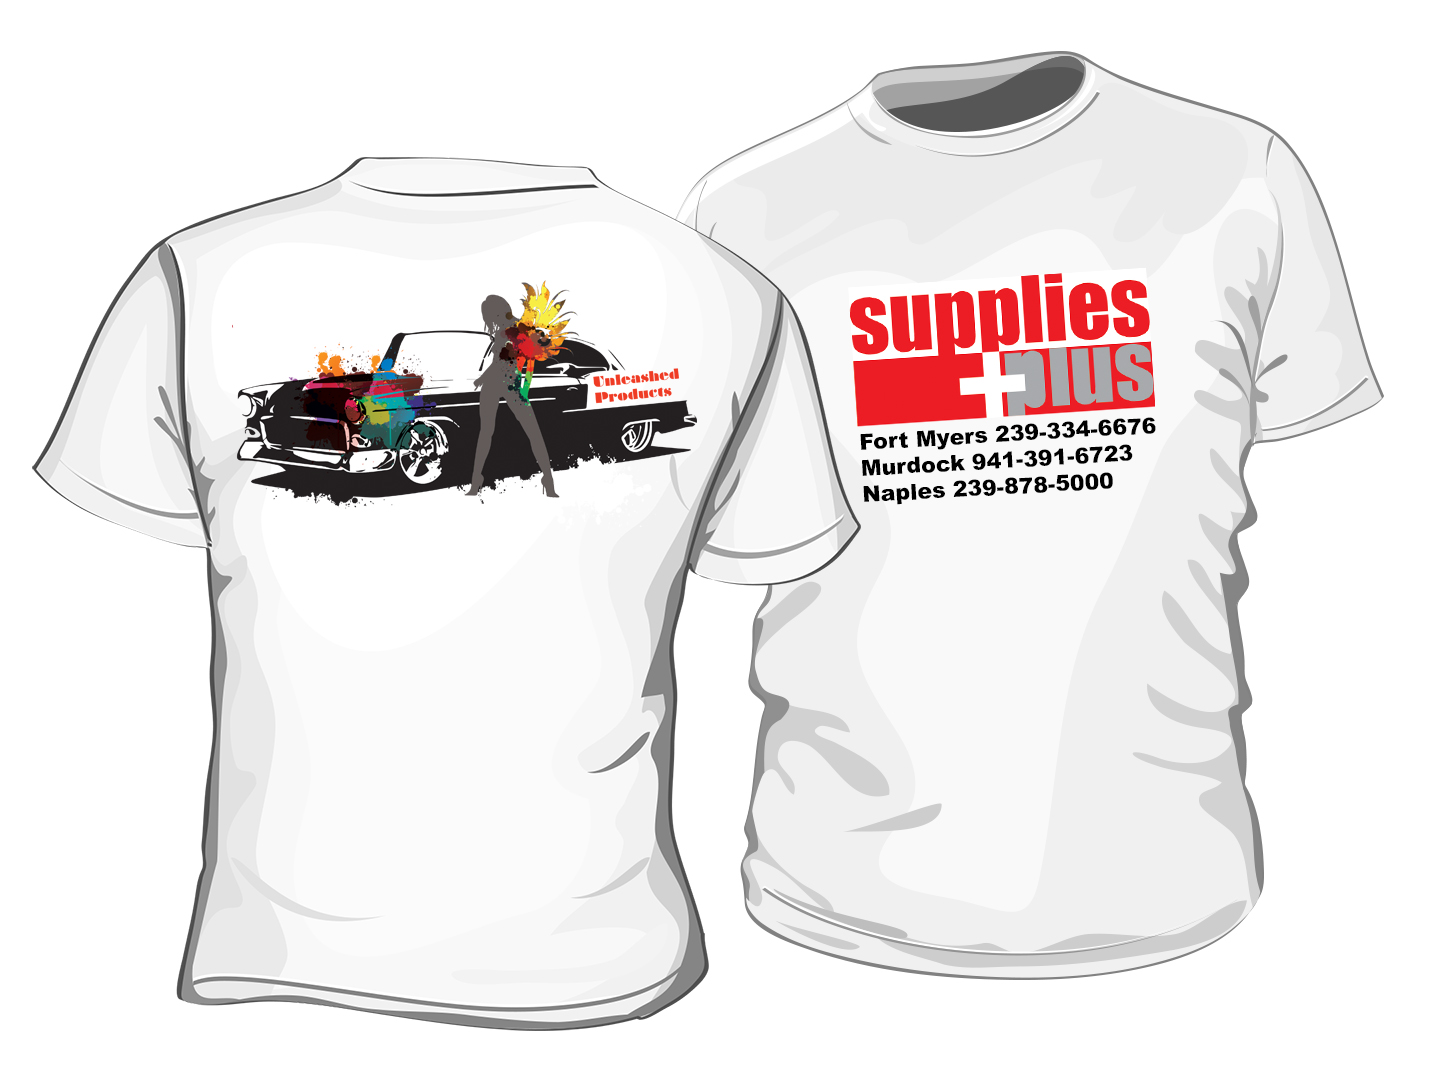 Shirt design supplies - T Shirt Design By Shivaparhizkari For Supplies Plus Needs T Shirt Of Automotive Design For